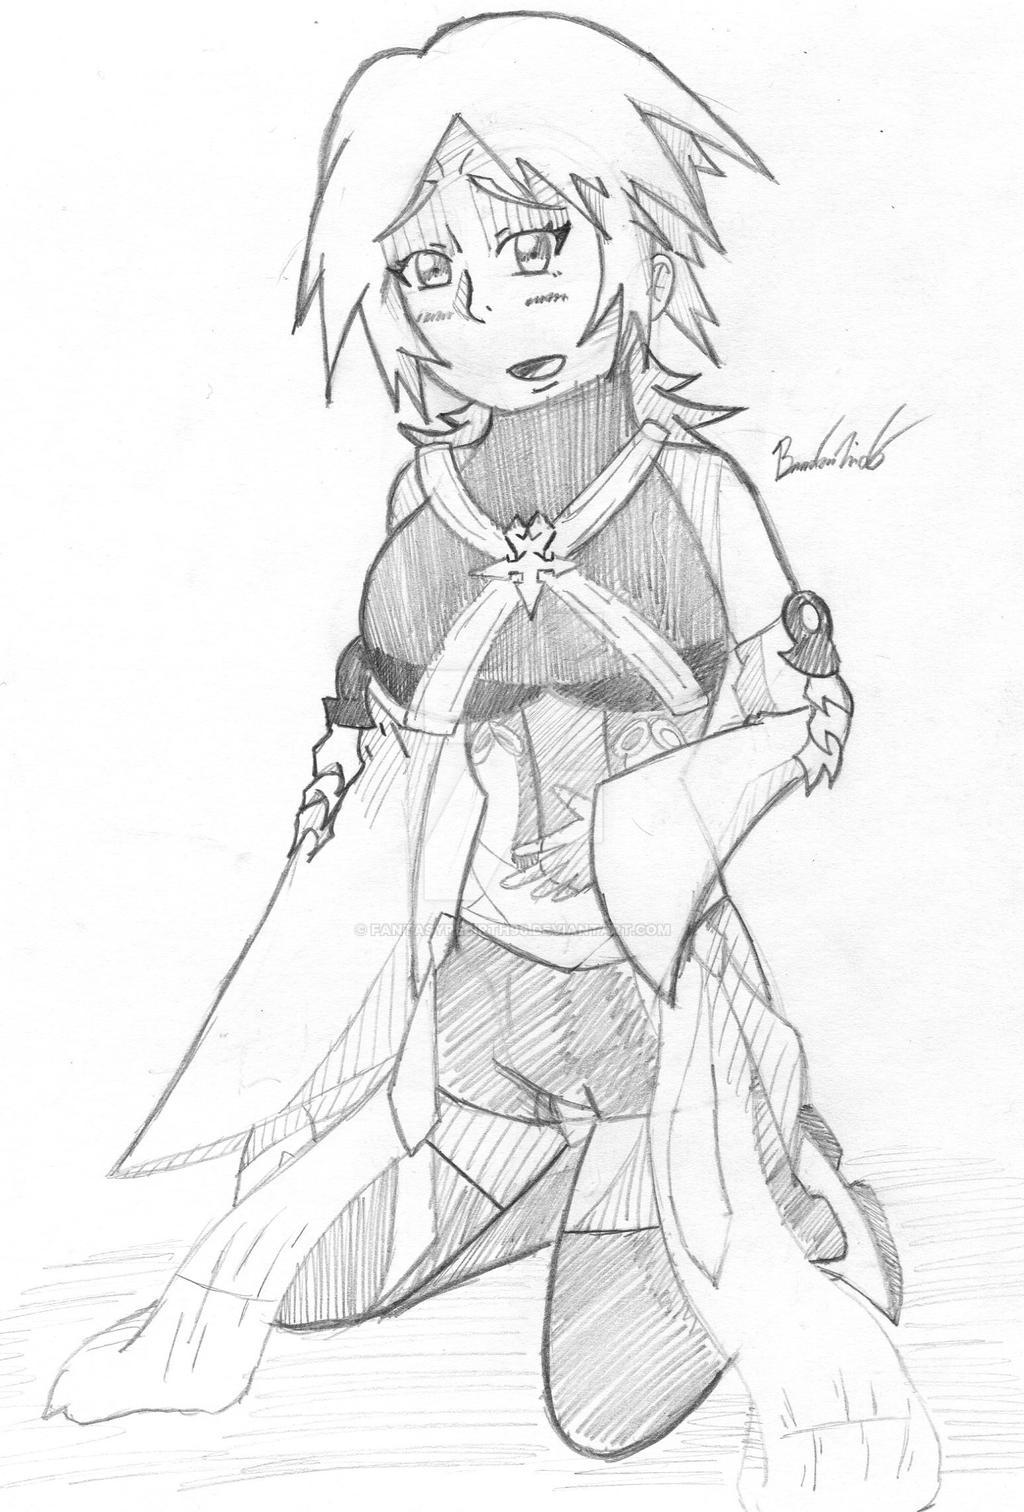 Aqua in pain sketch by FantasyRebirth96